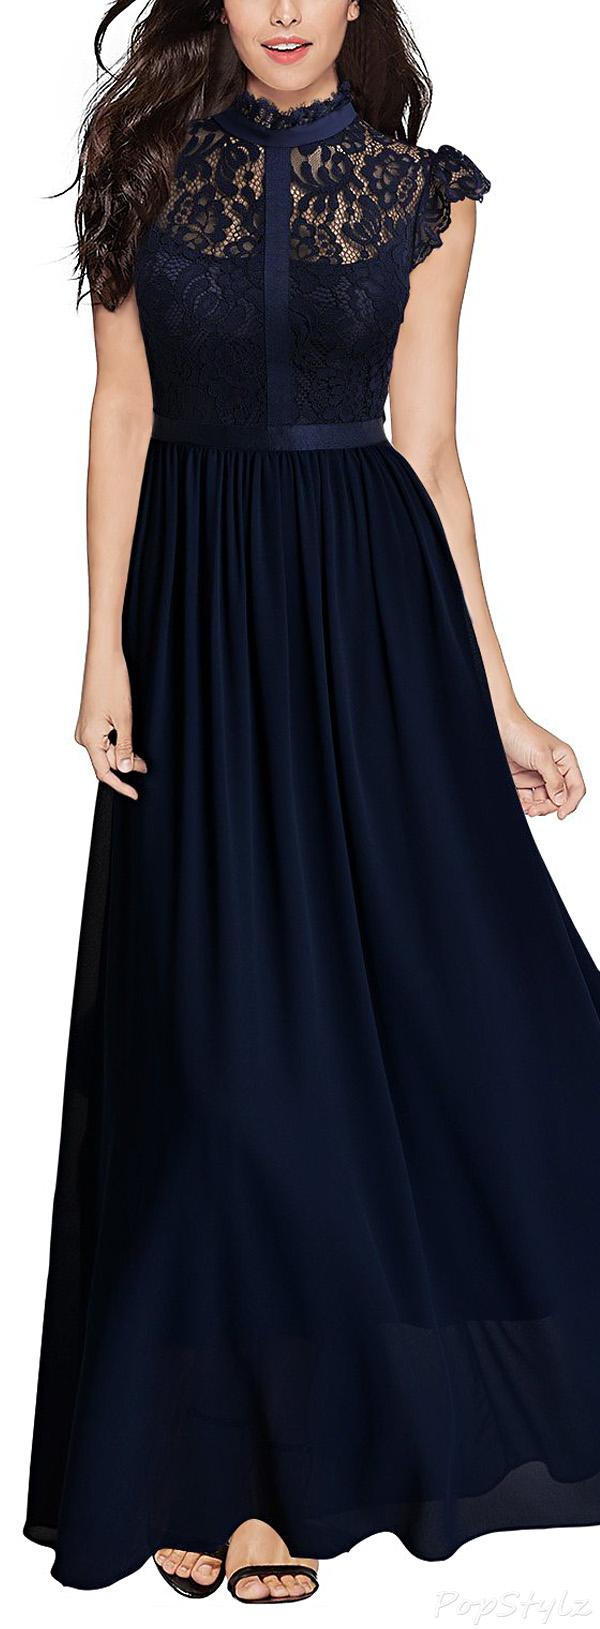 MIUSOL Floral Lace Cap Sleeve Long Evening Dress